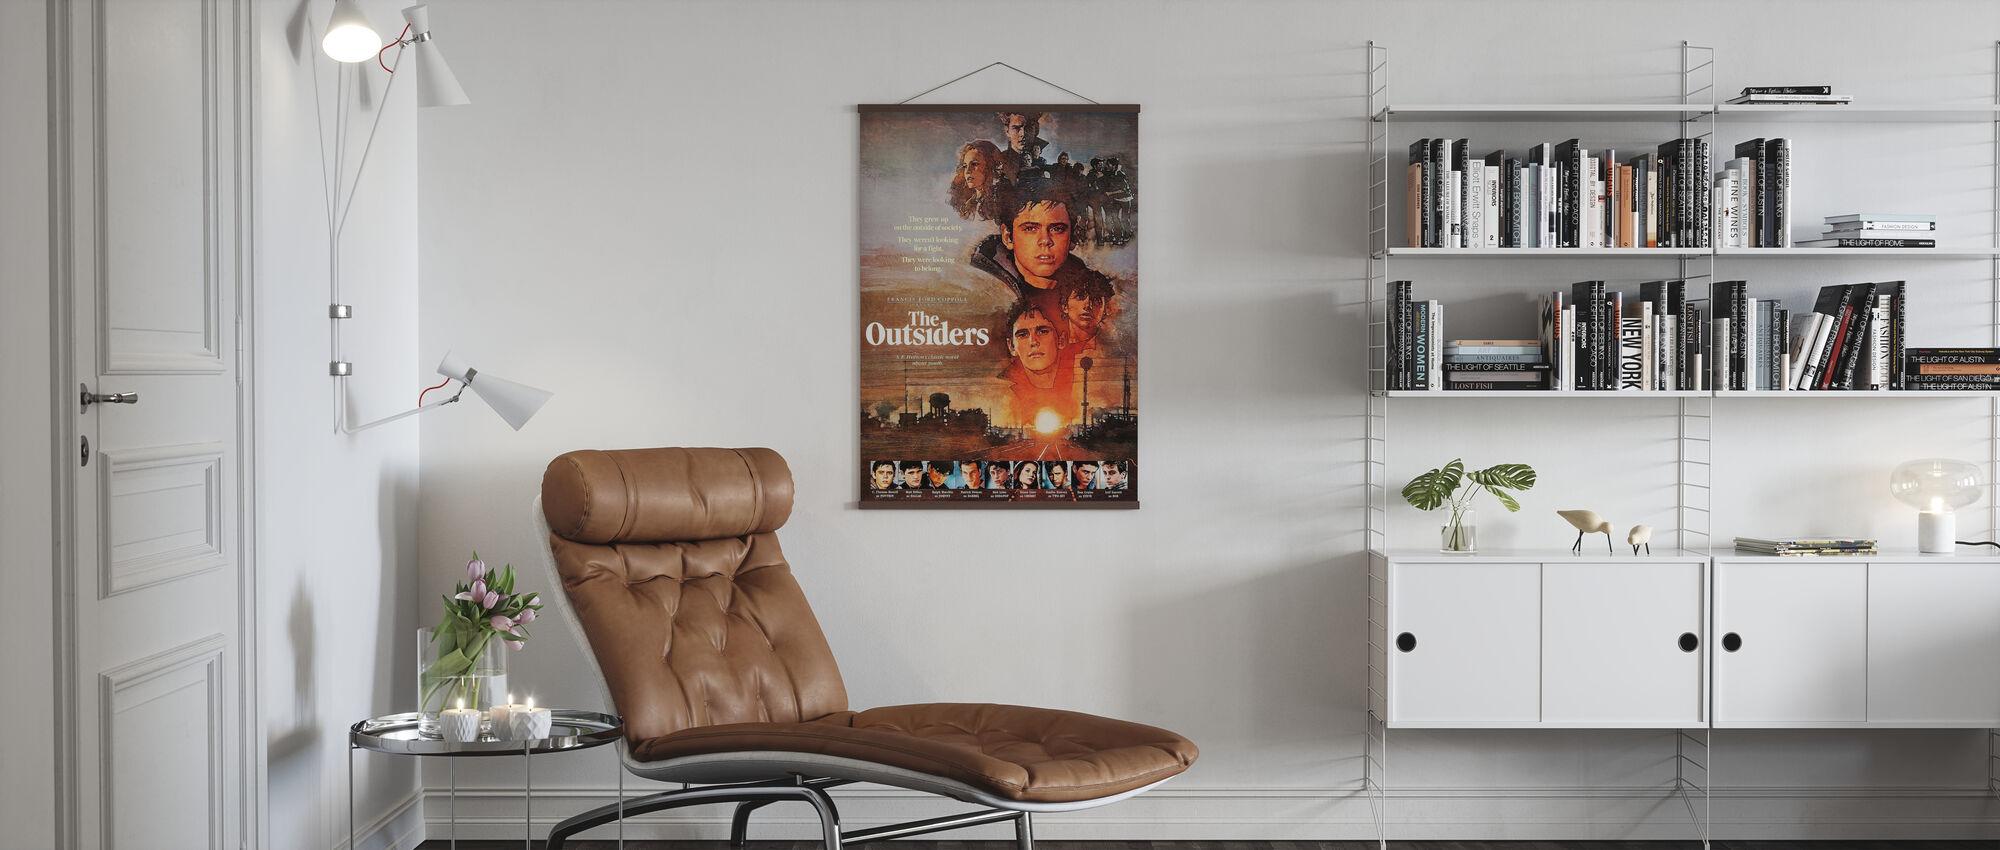 Outsiders - Poster - Living Room